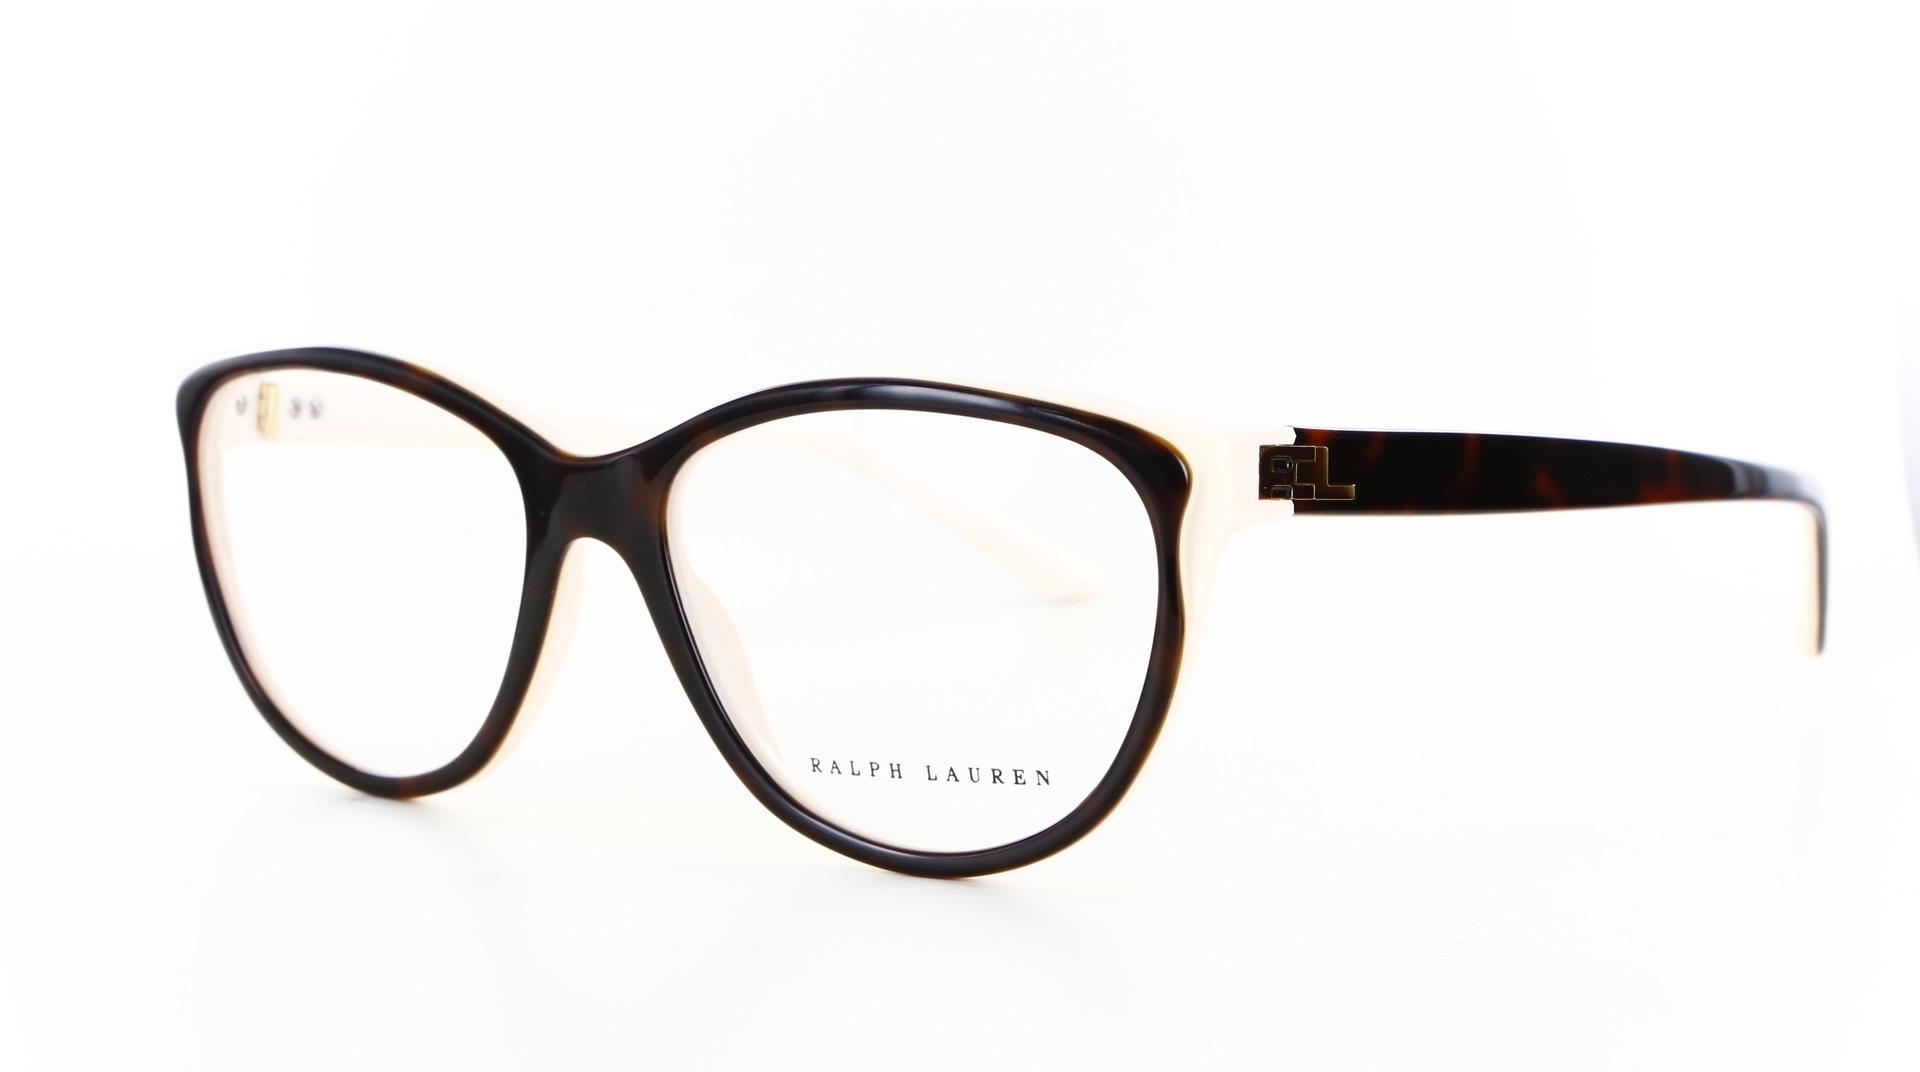 77569 | Polo Ralph Lauren Frames | Claeyssens Optic | Brugge & Gent